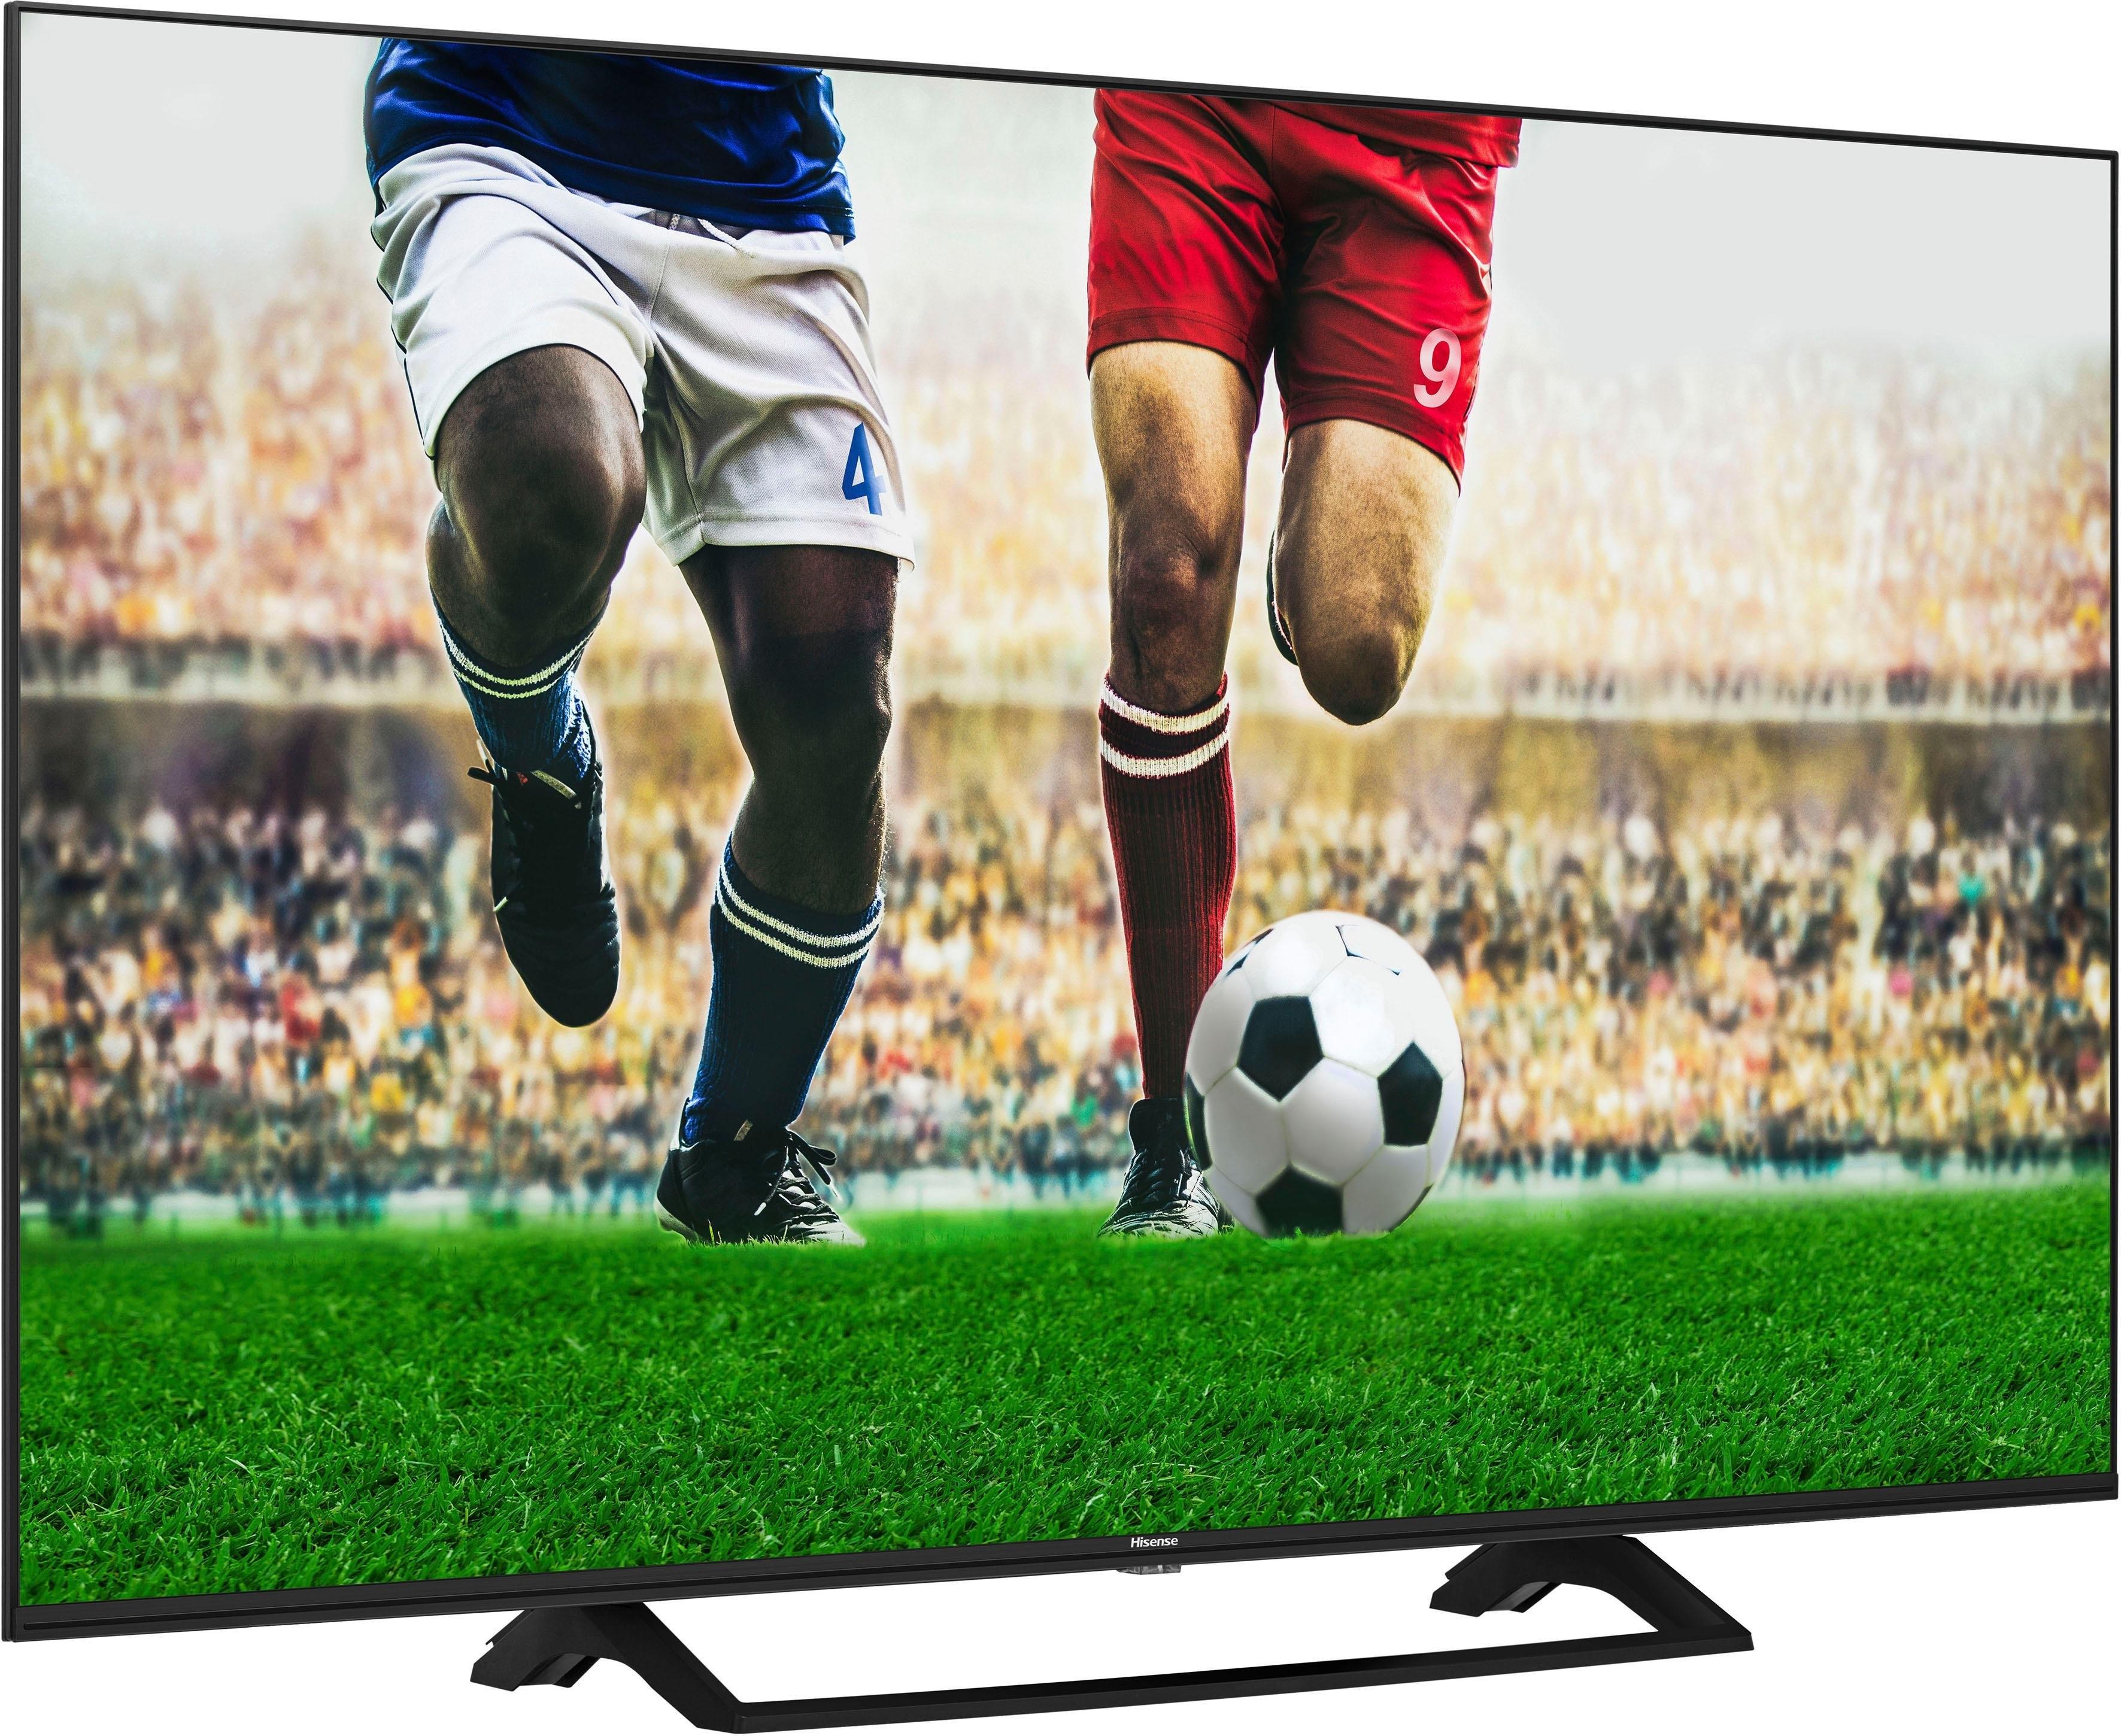 Hisense 43AE7200F LED-televisie (108 cm / (43 Inch), 4K Ultra HD, Smart-TV voordelig en veilig online kopen